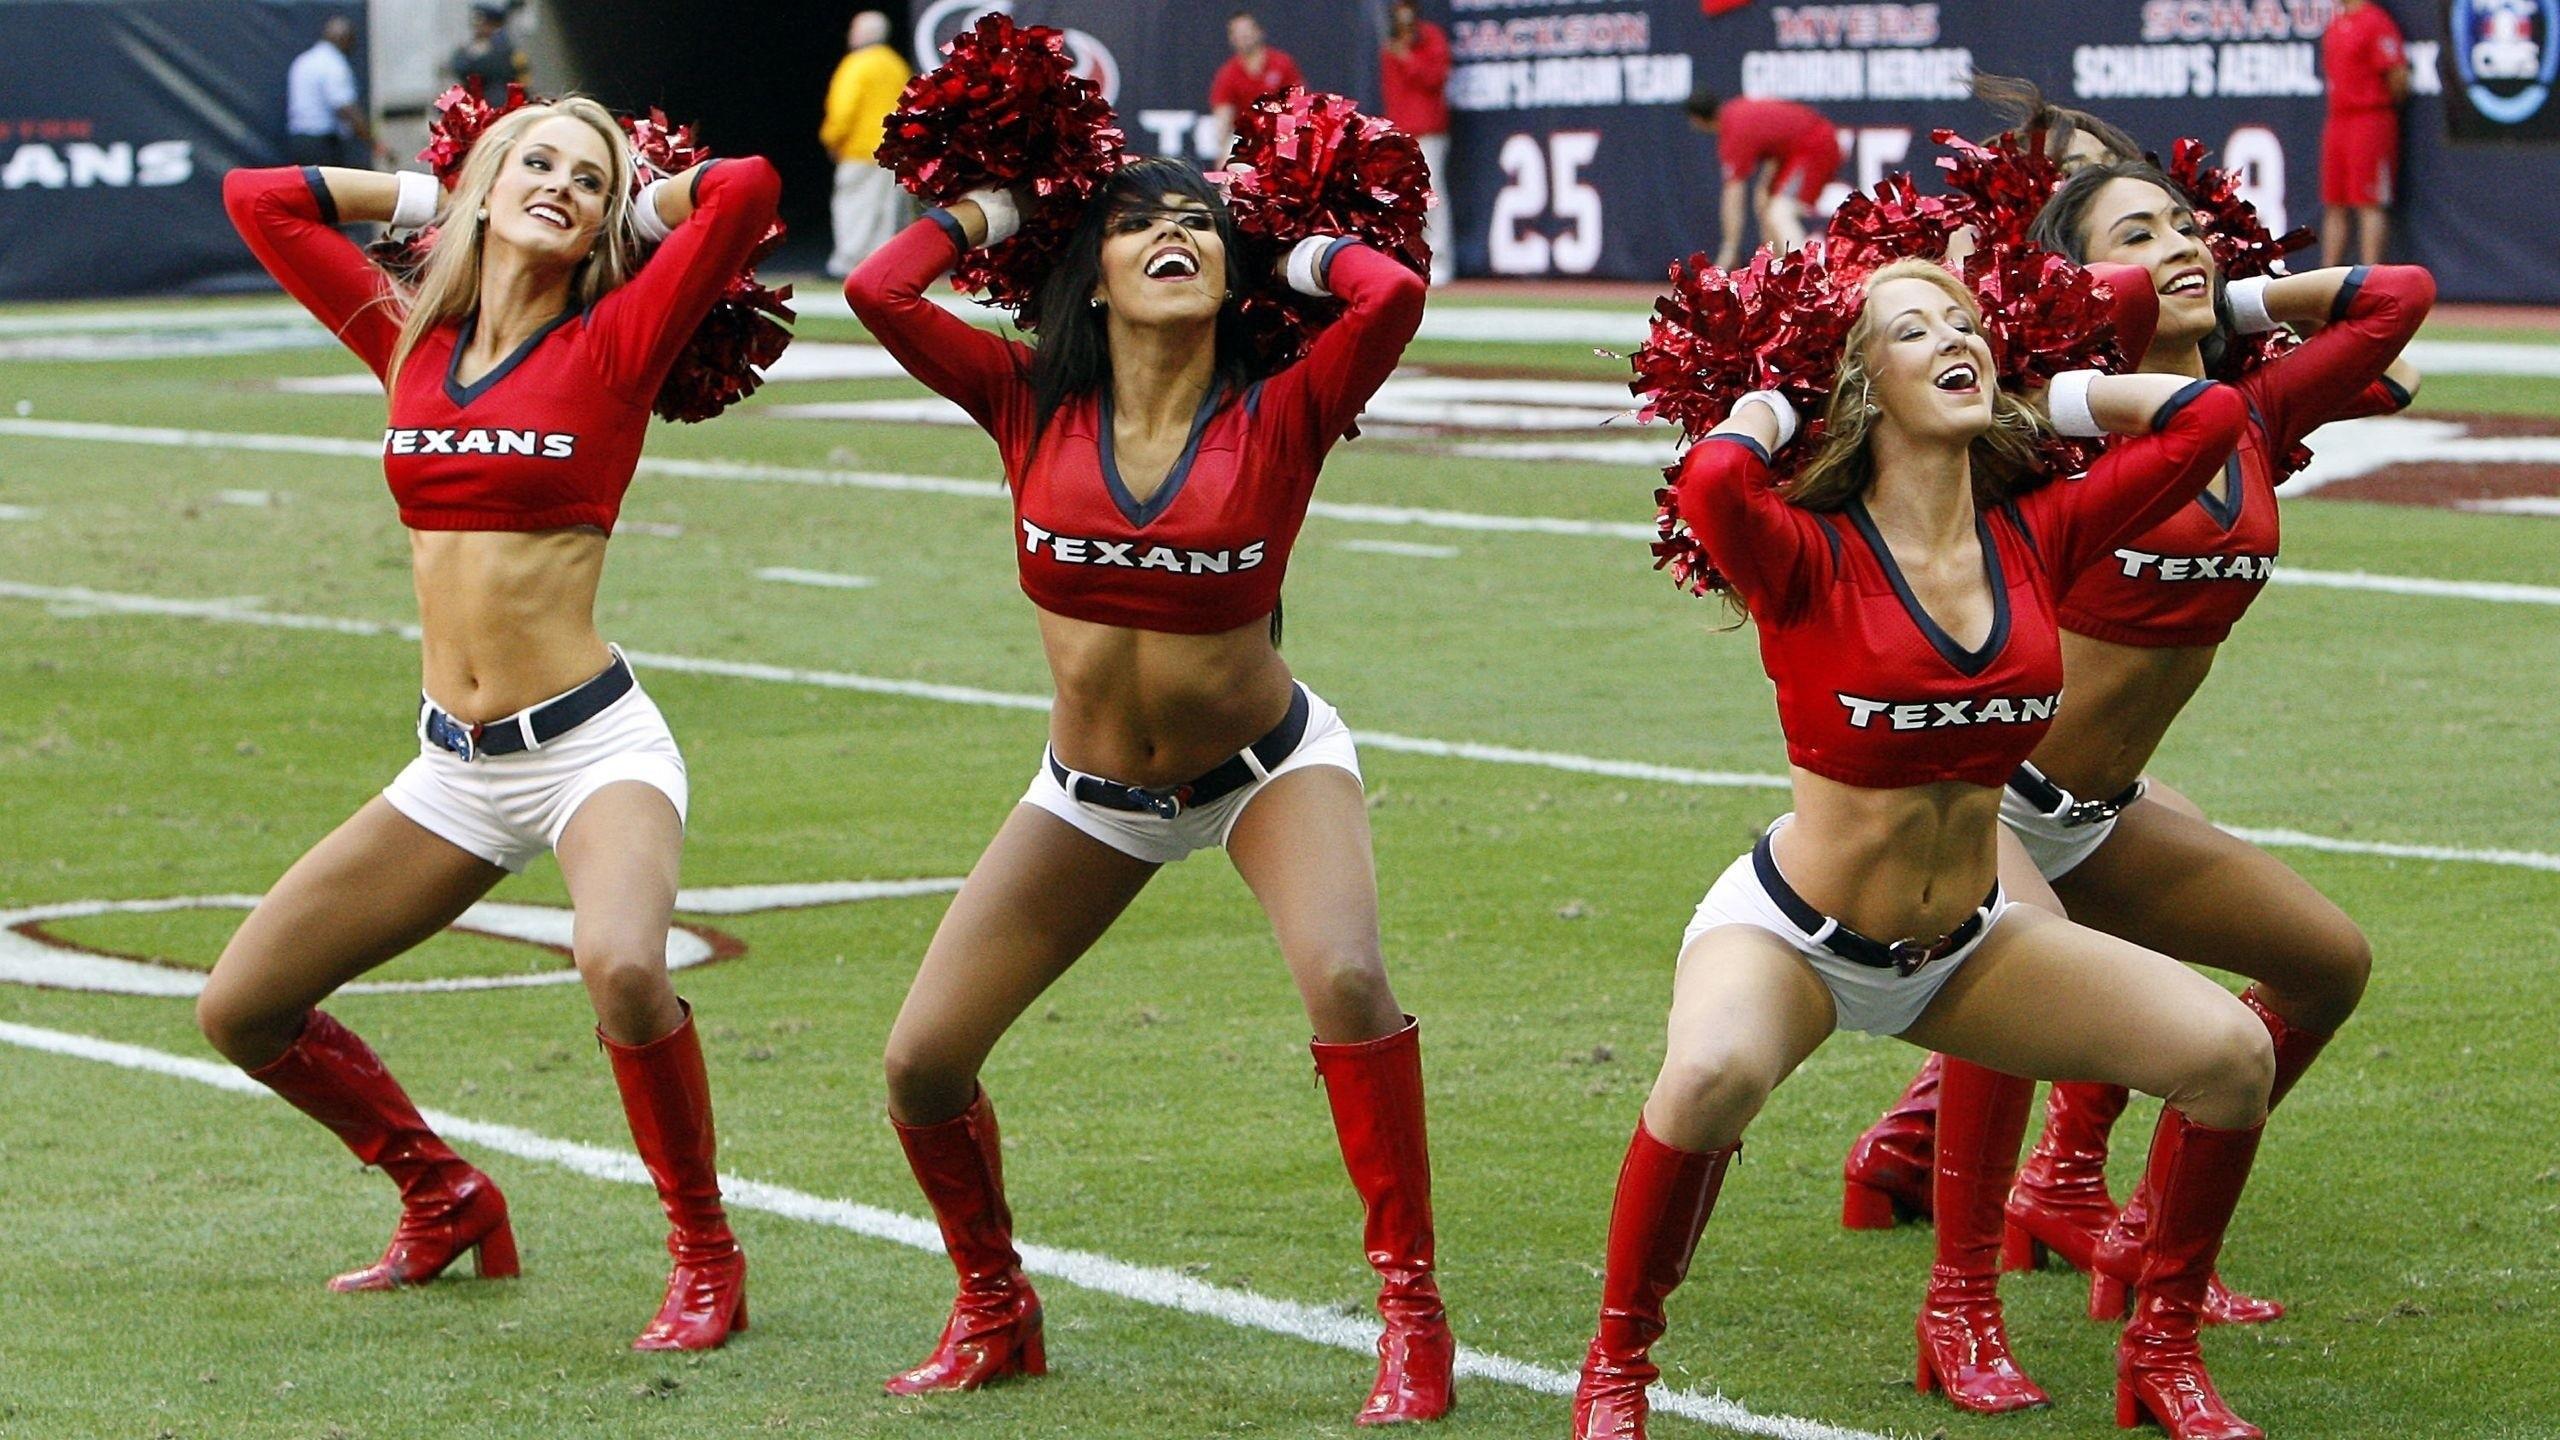 Houston Texans American Football, American Football, Houston Texans, Houston  Texans Nfl, Nfl